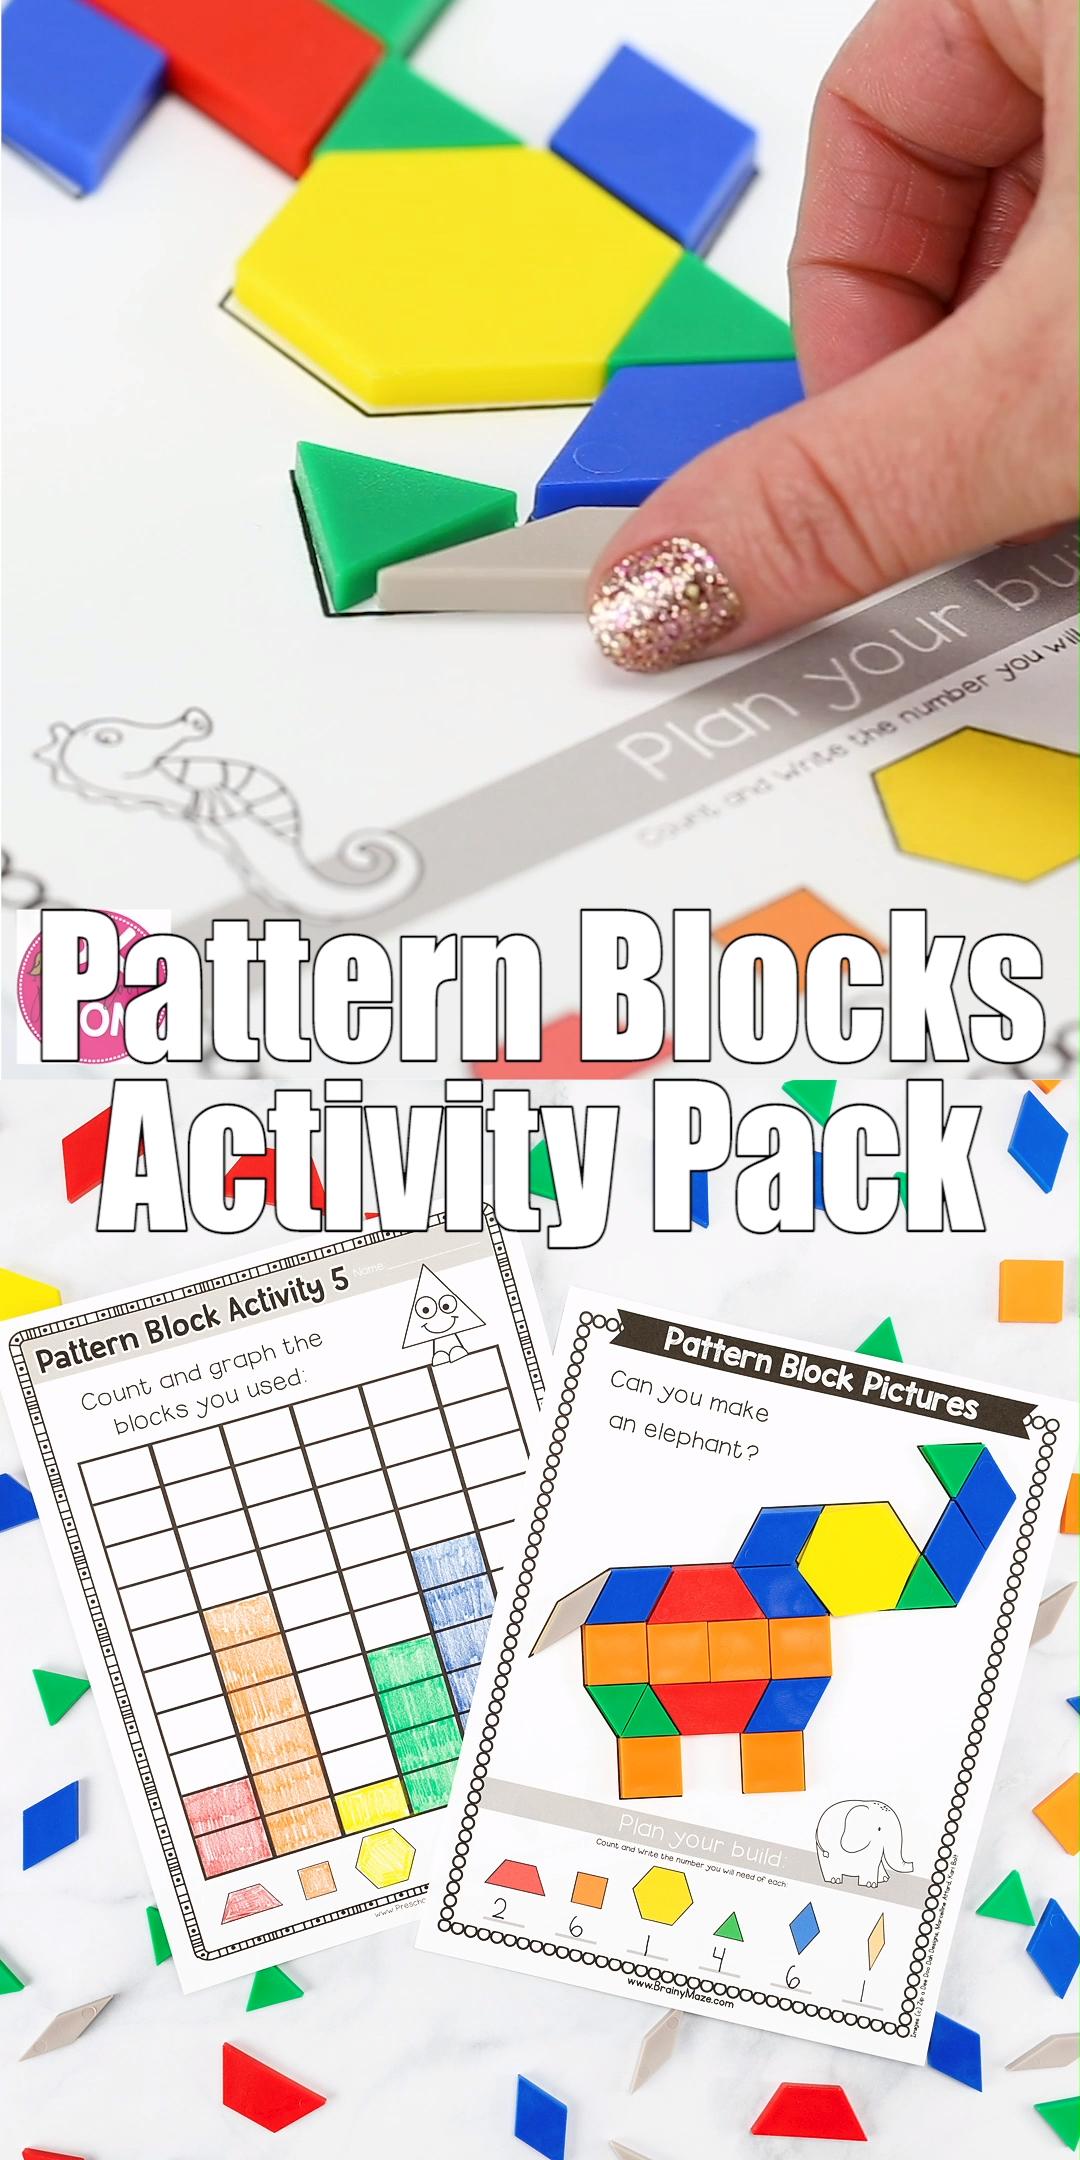 Pattern Block Activity Pack Video Video Pattern Blocks Activities Pattern Block Templates Pattern Blocks [ 2160 x 1080 Pixel ]